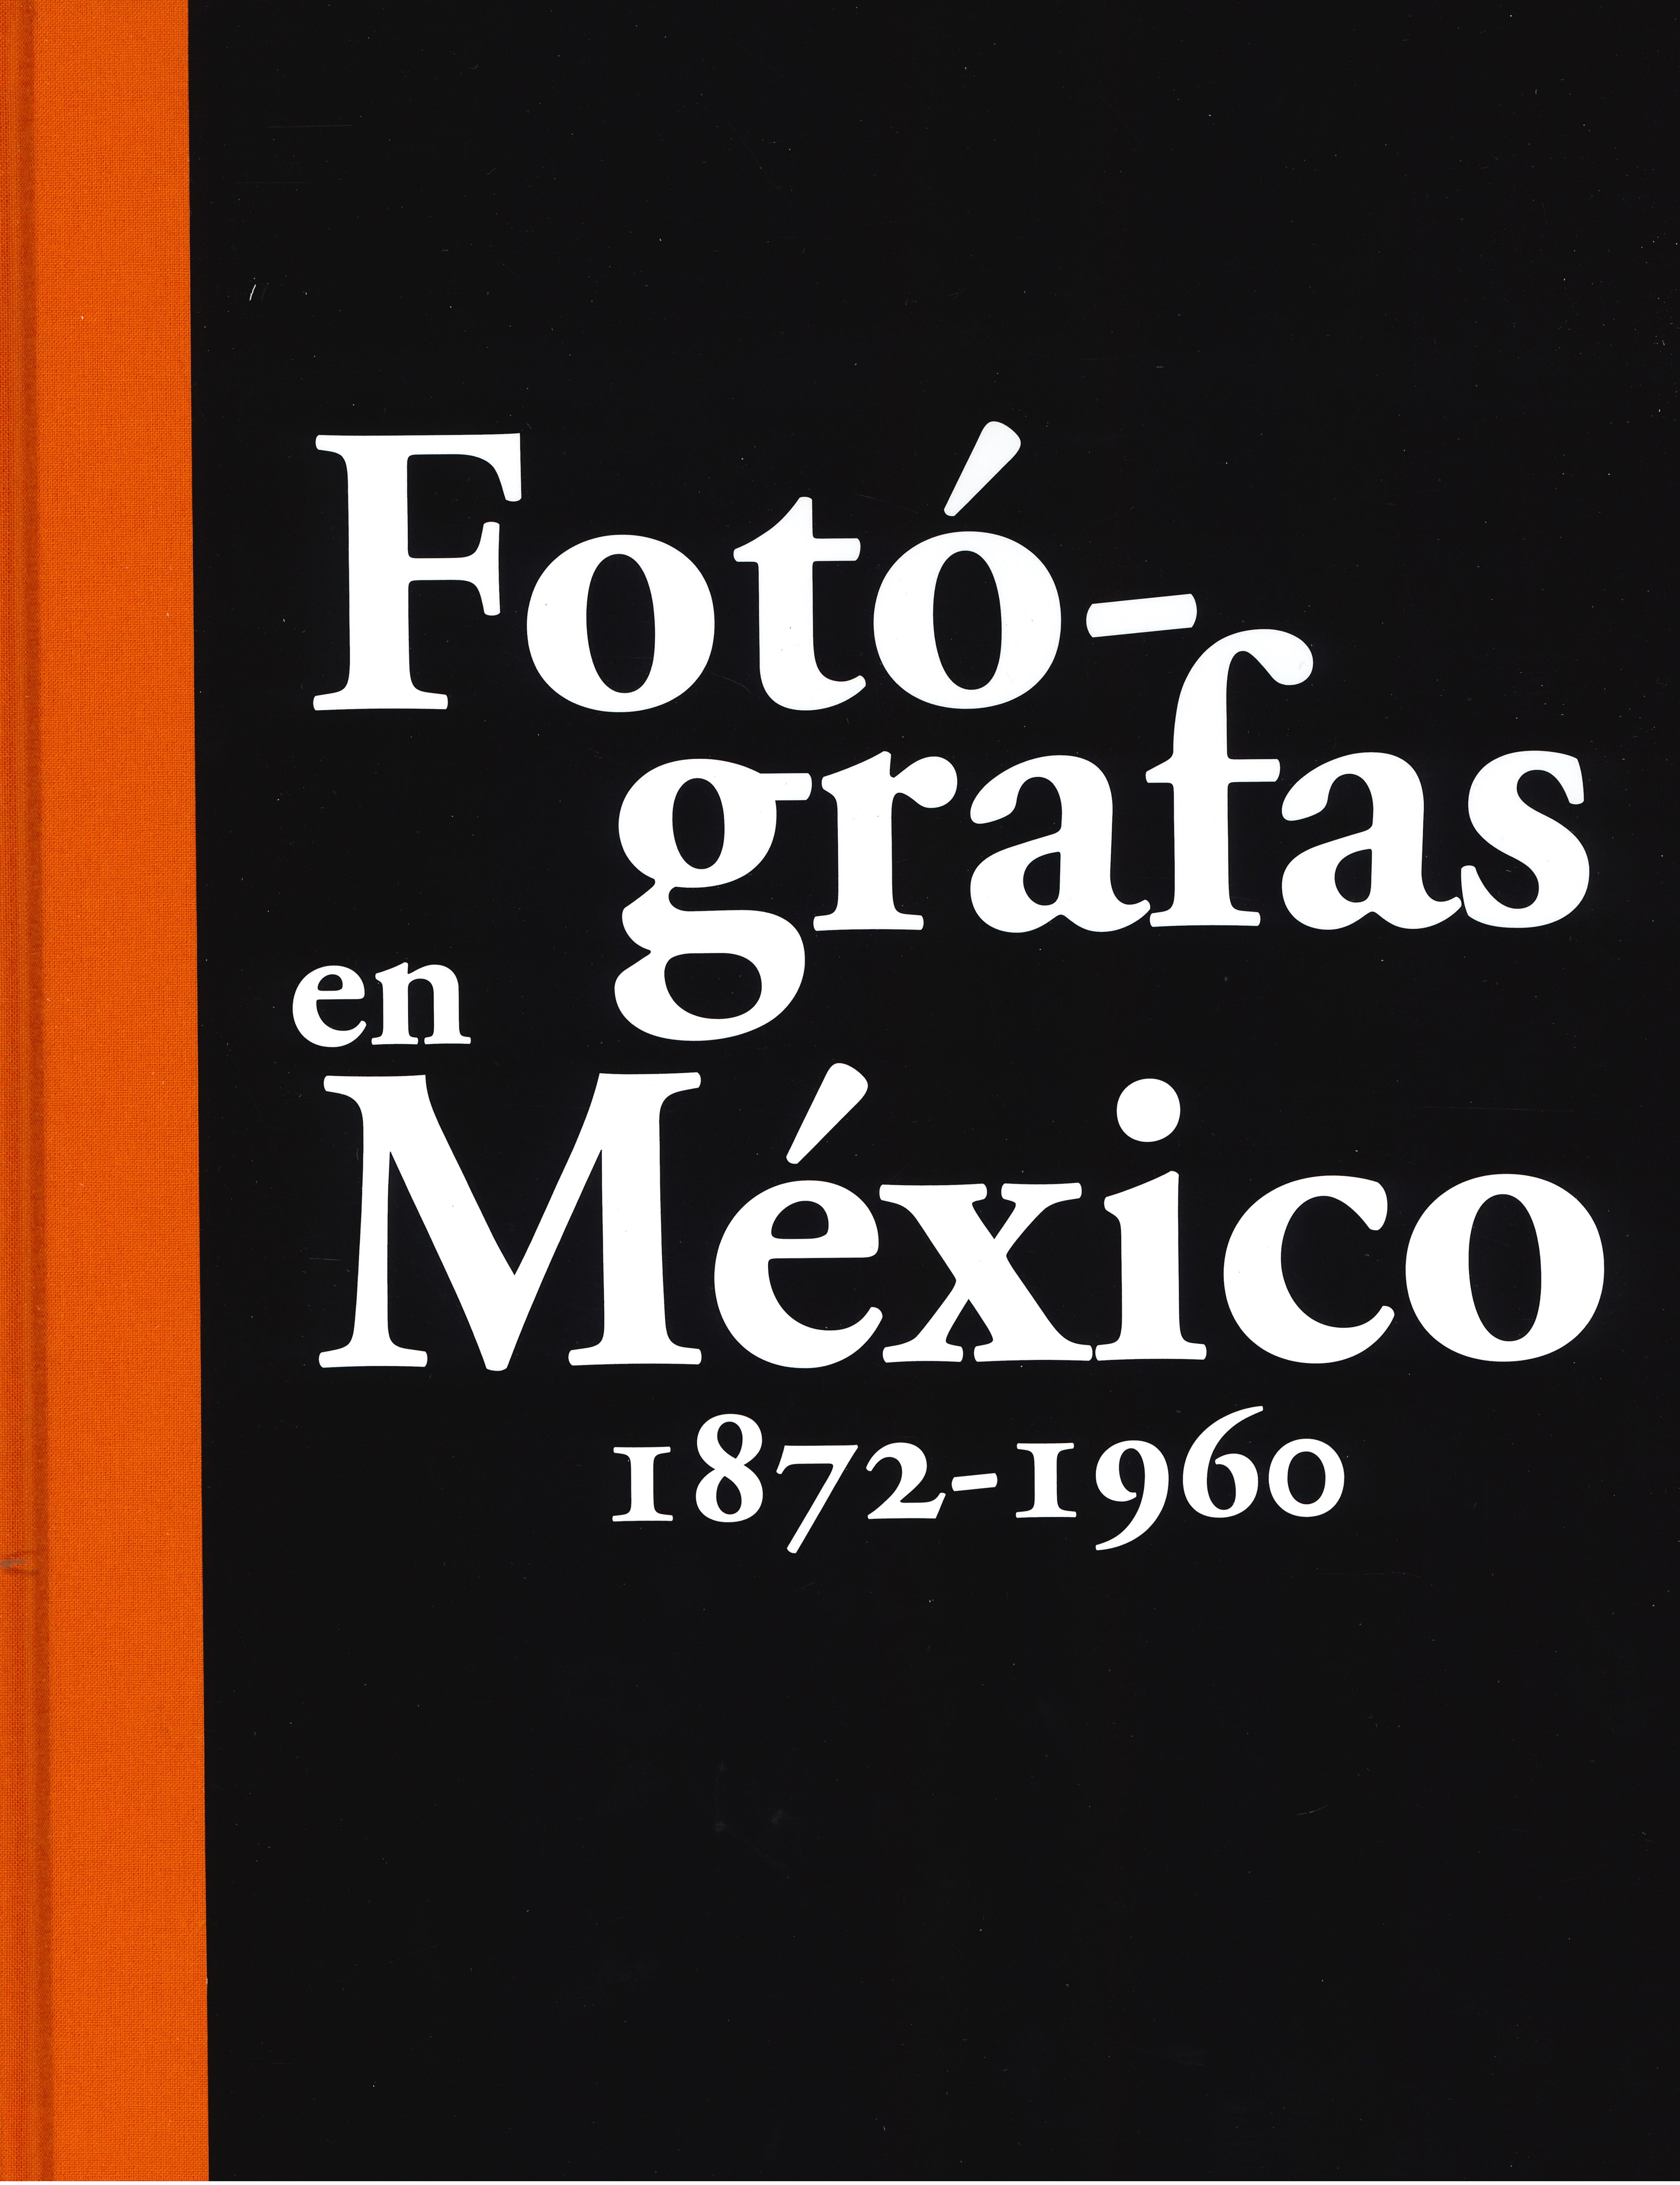 fotografas_en_mexico.jpg